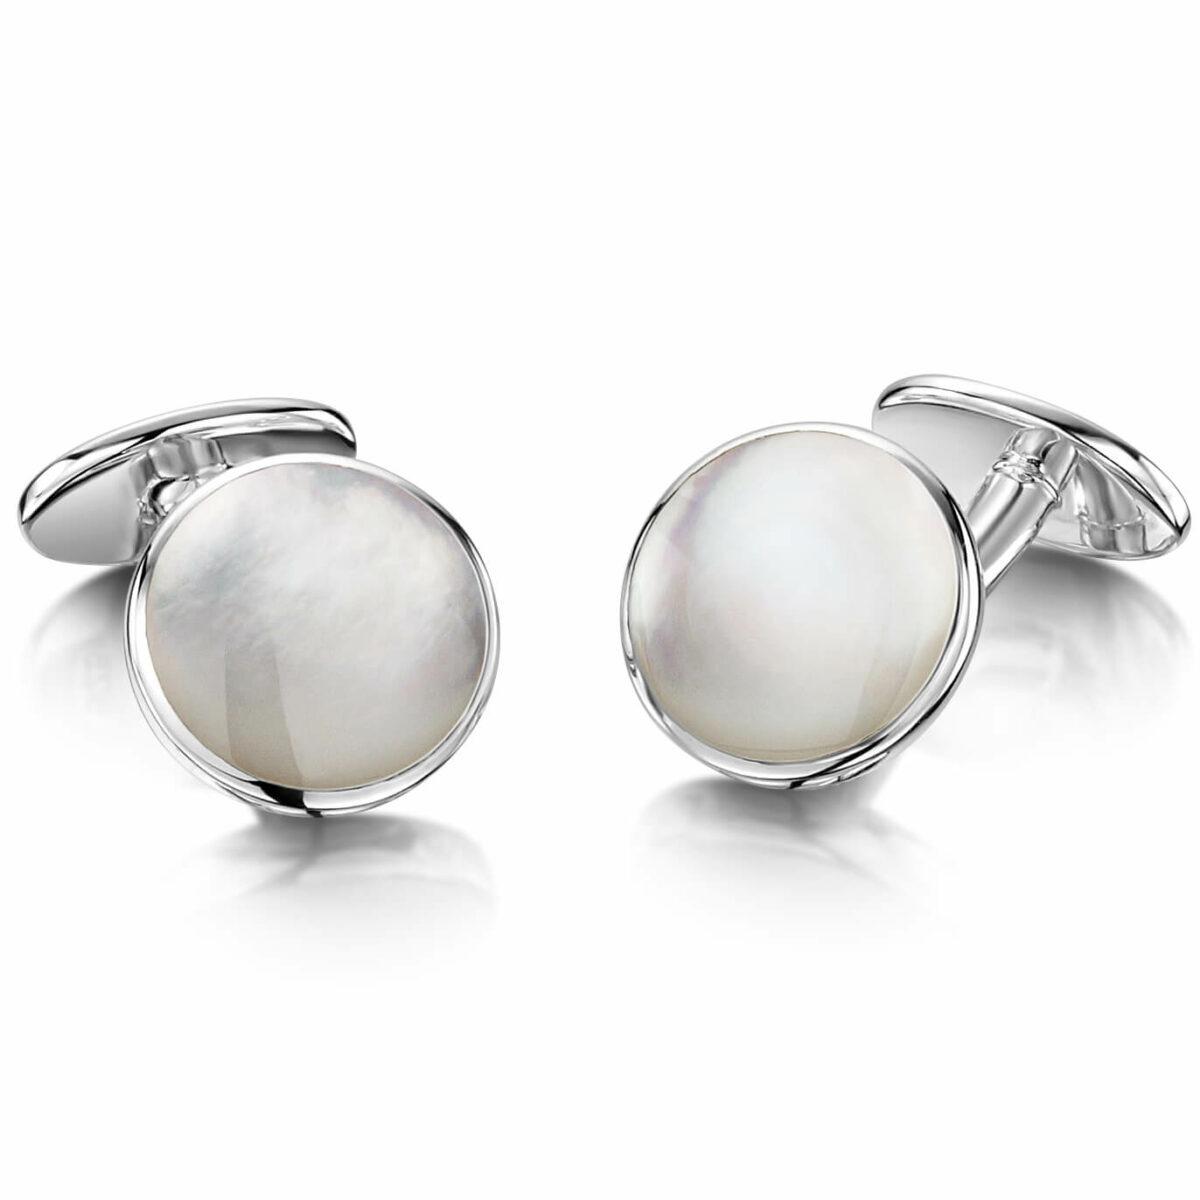 Hylton Engraved Cufflinks - Pearl